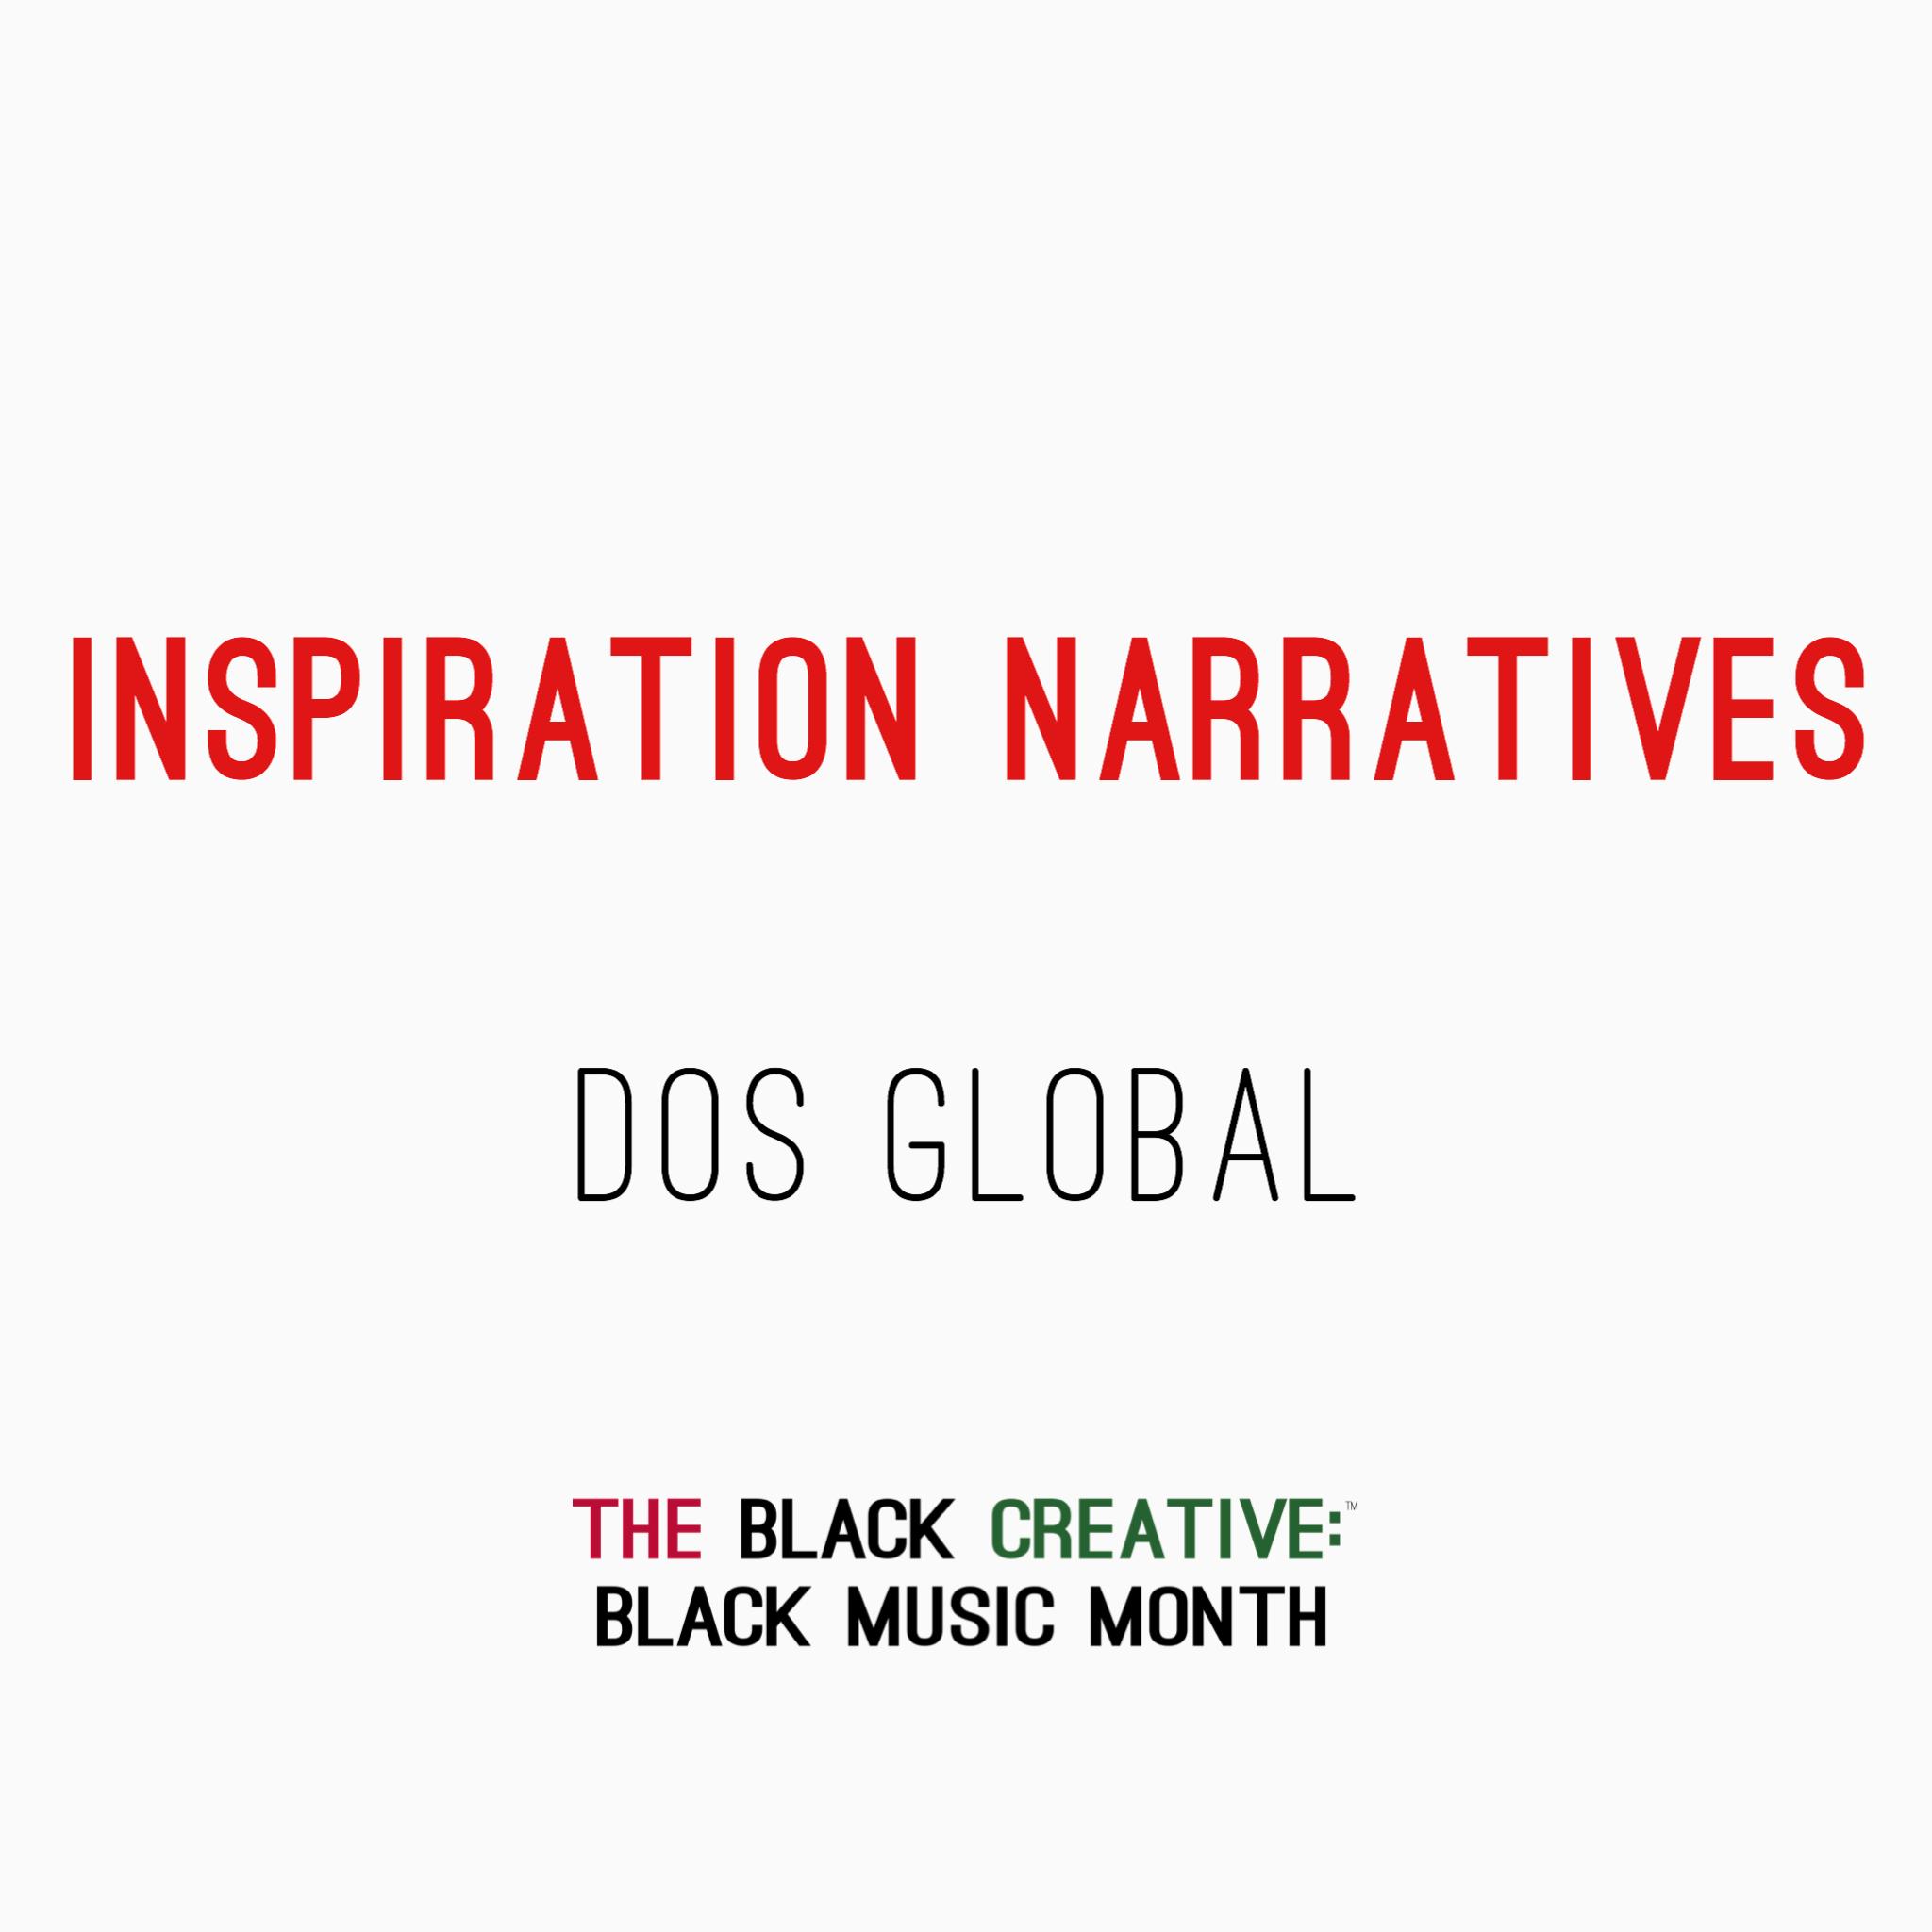 Inspiration Narratives - Dos Global